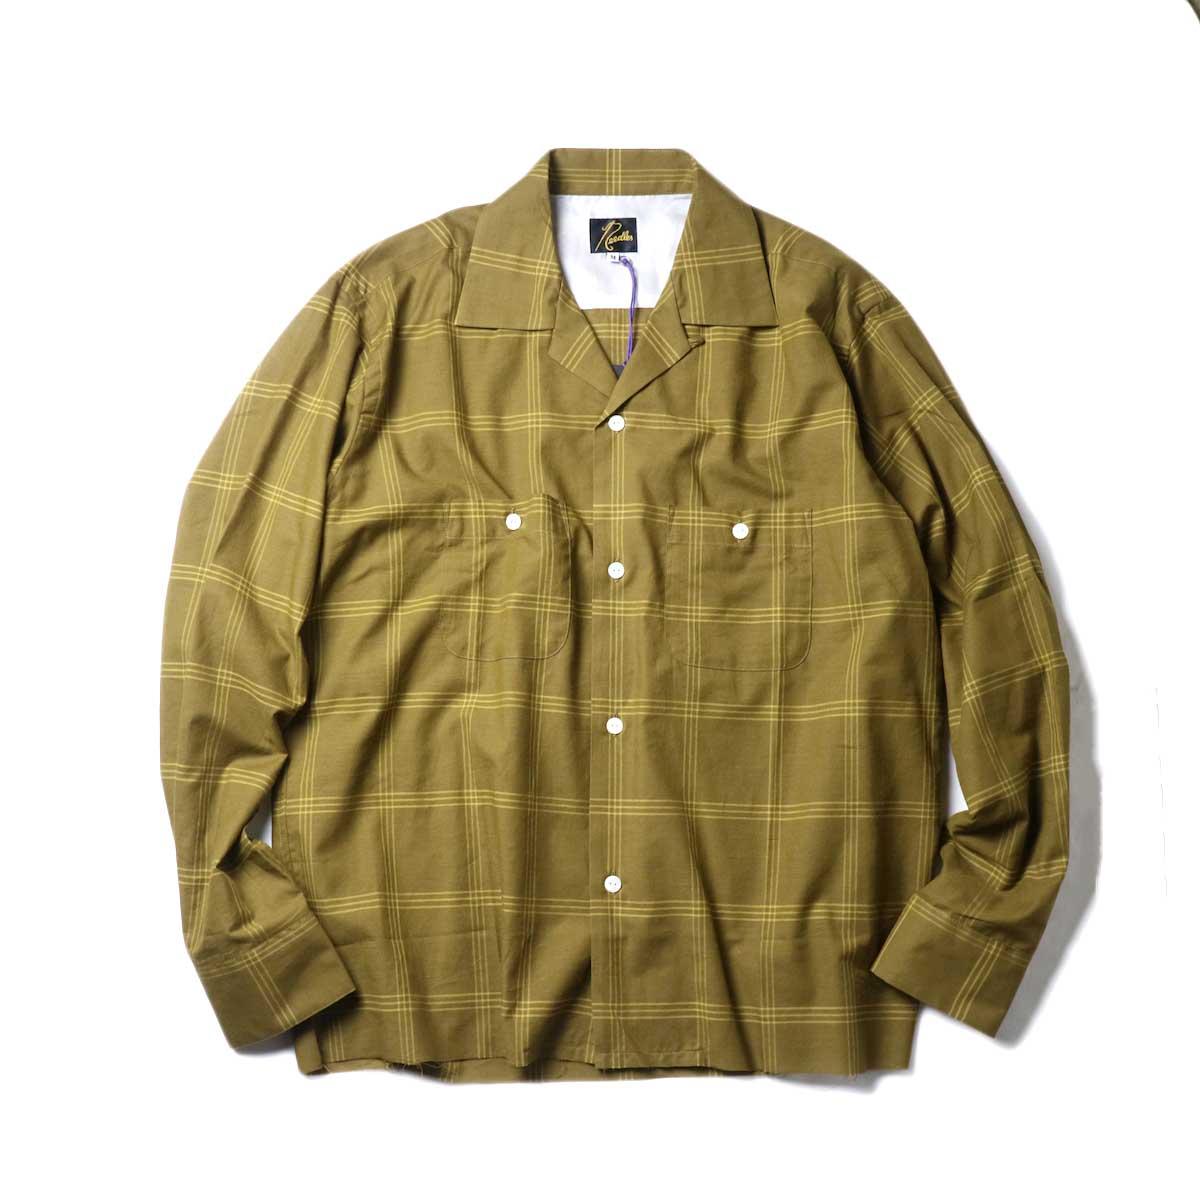 Needles / C.O.B One-Up Shirt -C/S Plaid (Brown)